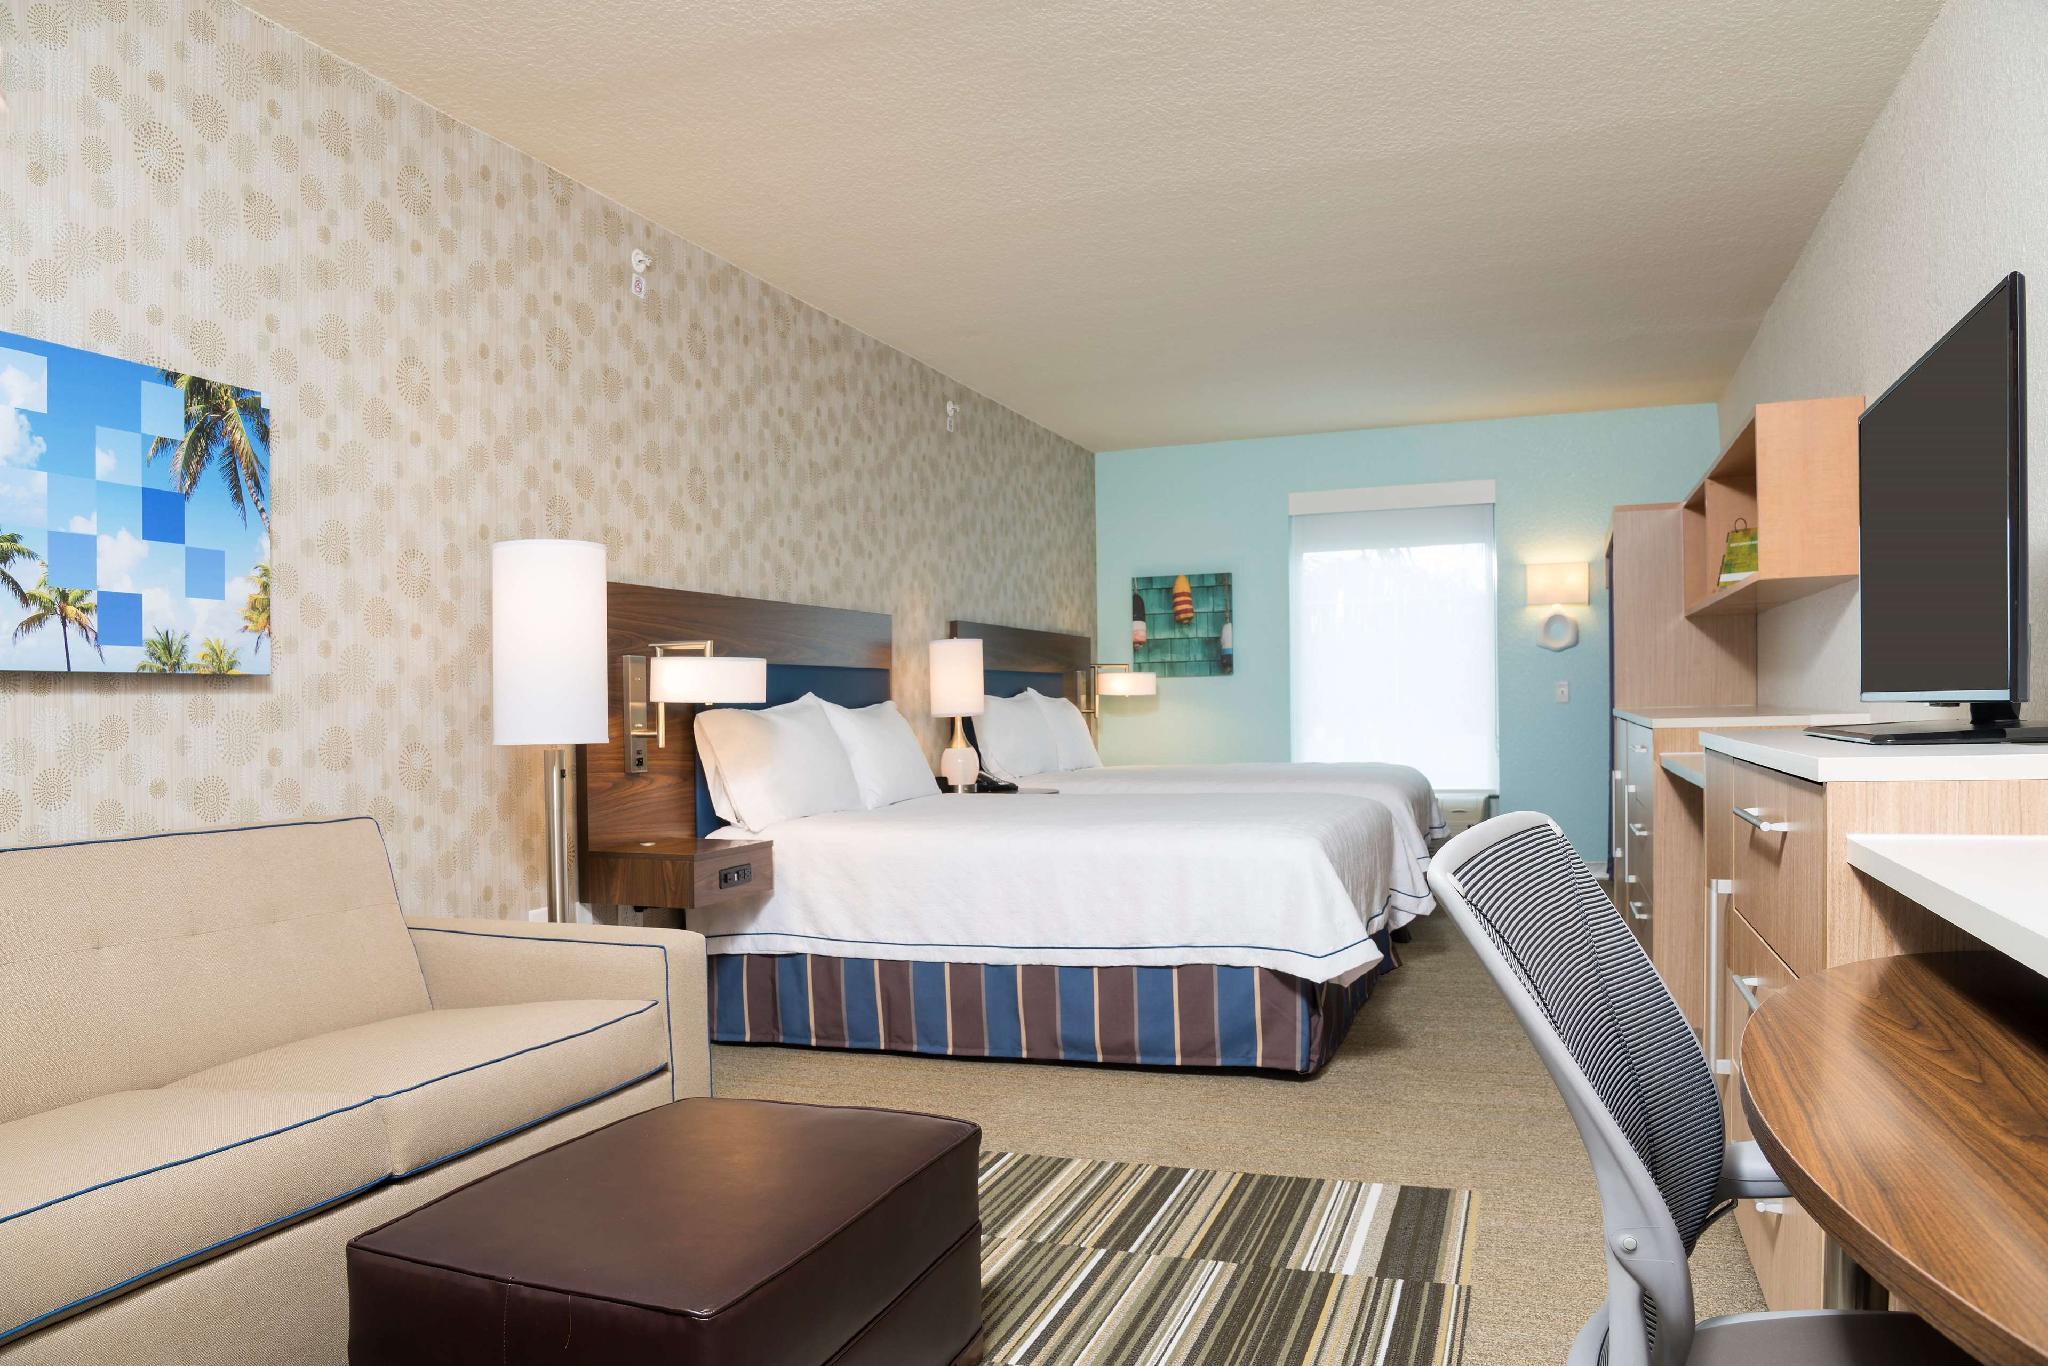 Home2 Suites by Hilton Nokomis Sarasota Casey Key, Sarasota